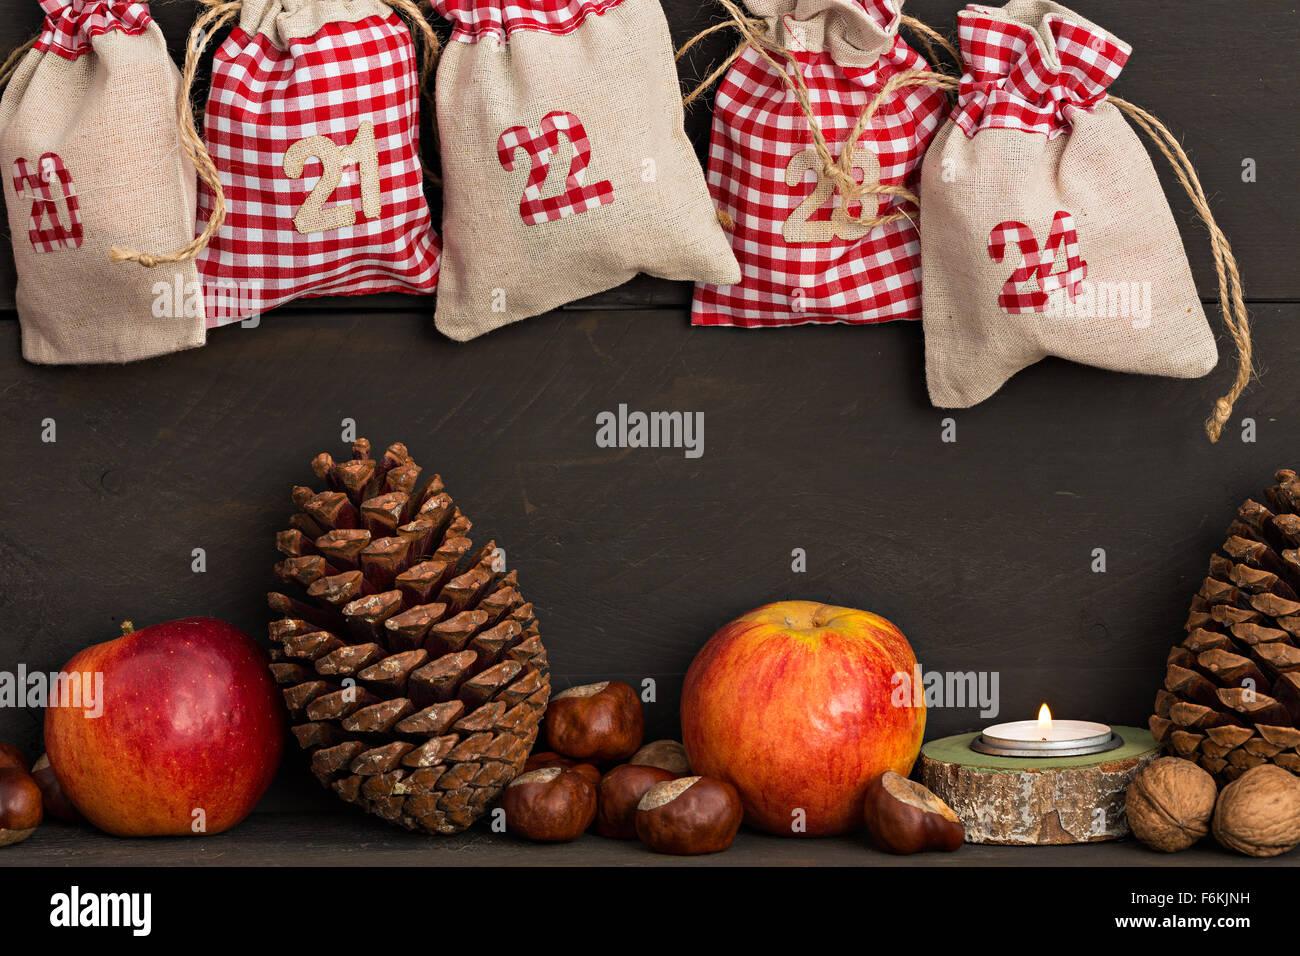 Christmas calendar - Advent, Santa Claus - Stock Image